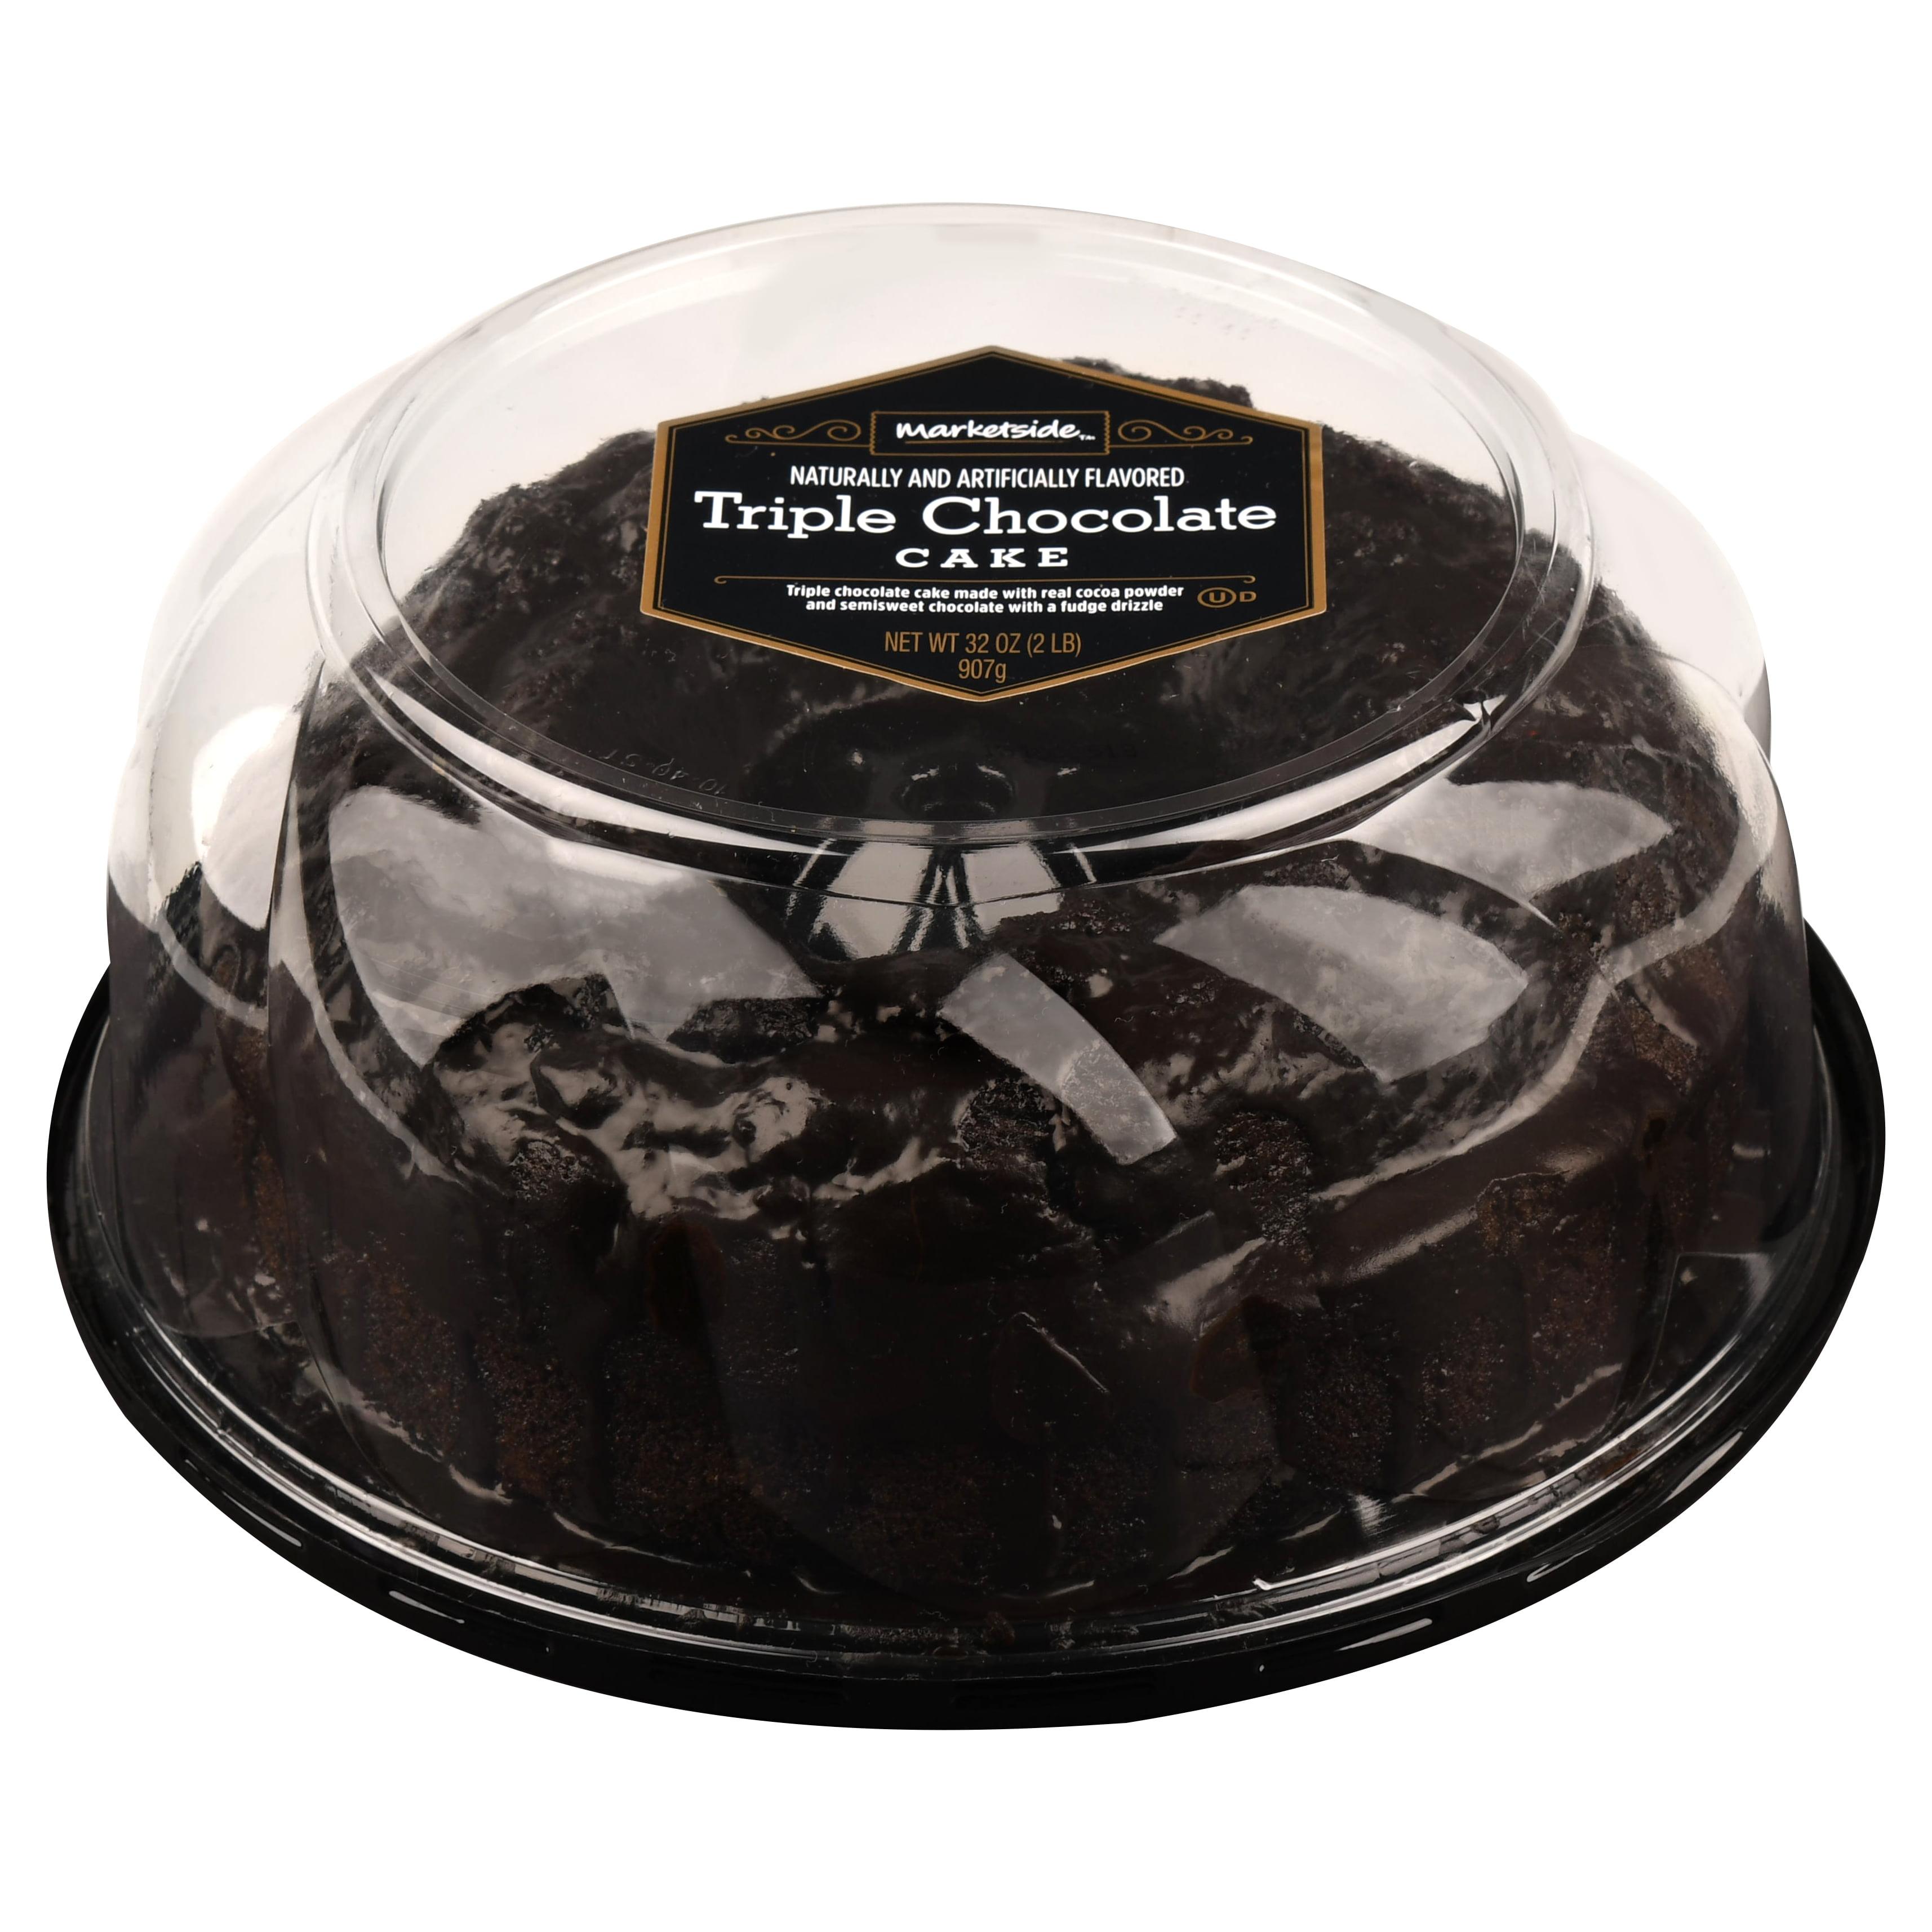 Marketside Triple Chocolate Cake 32 Oz